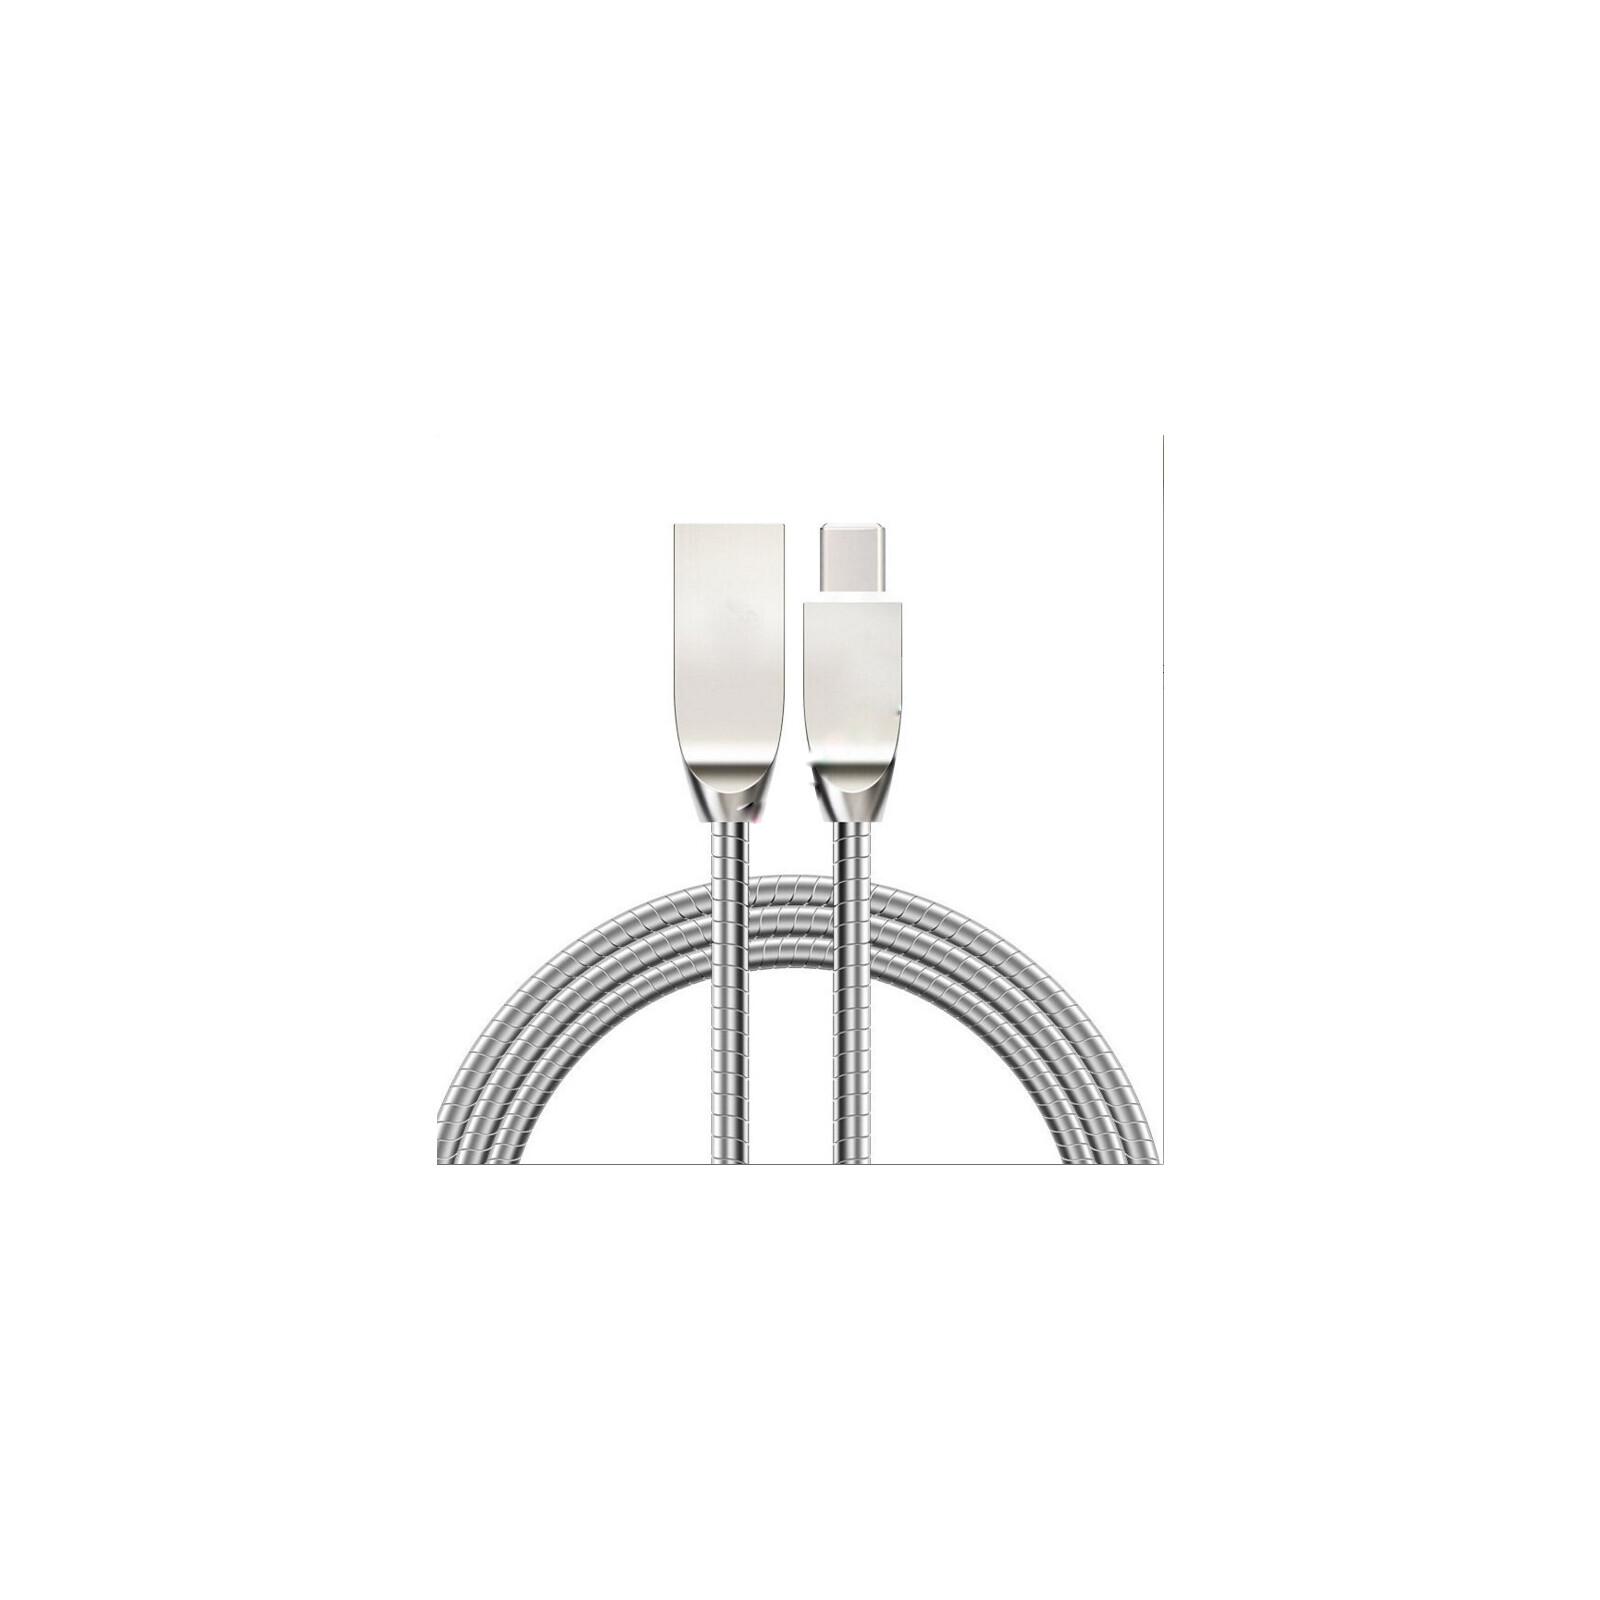 Felixx Data USB-C Metall 1 Meter